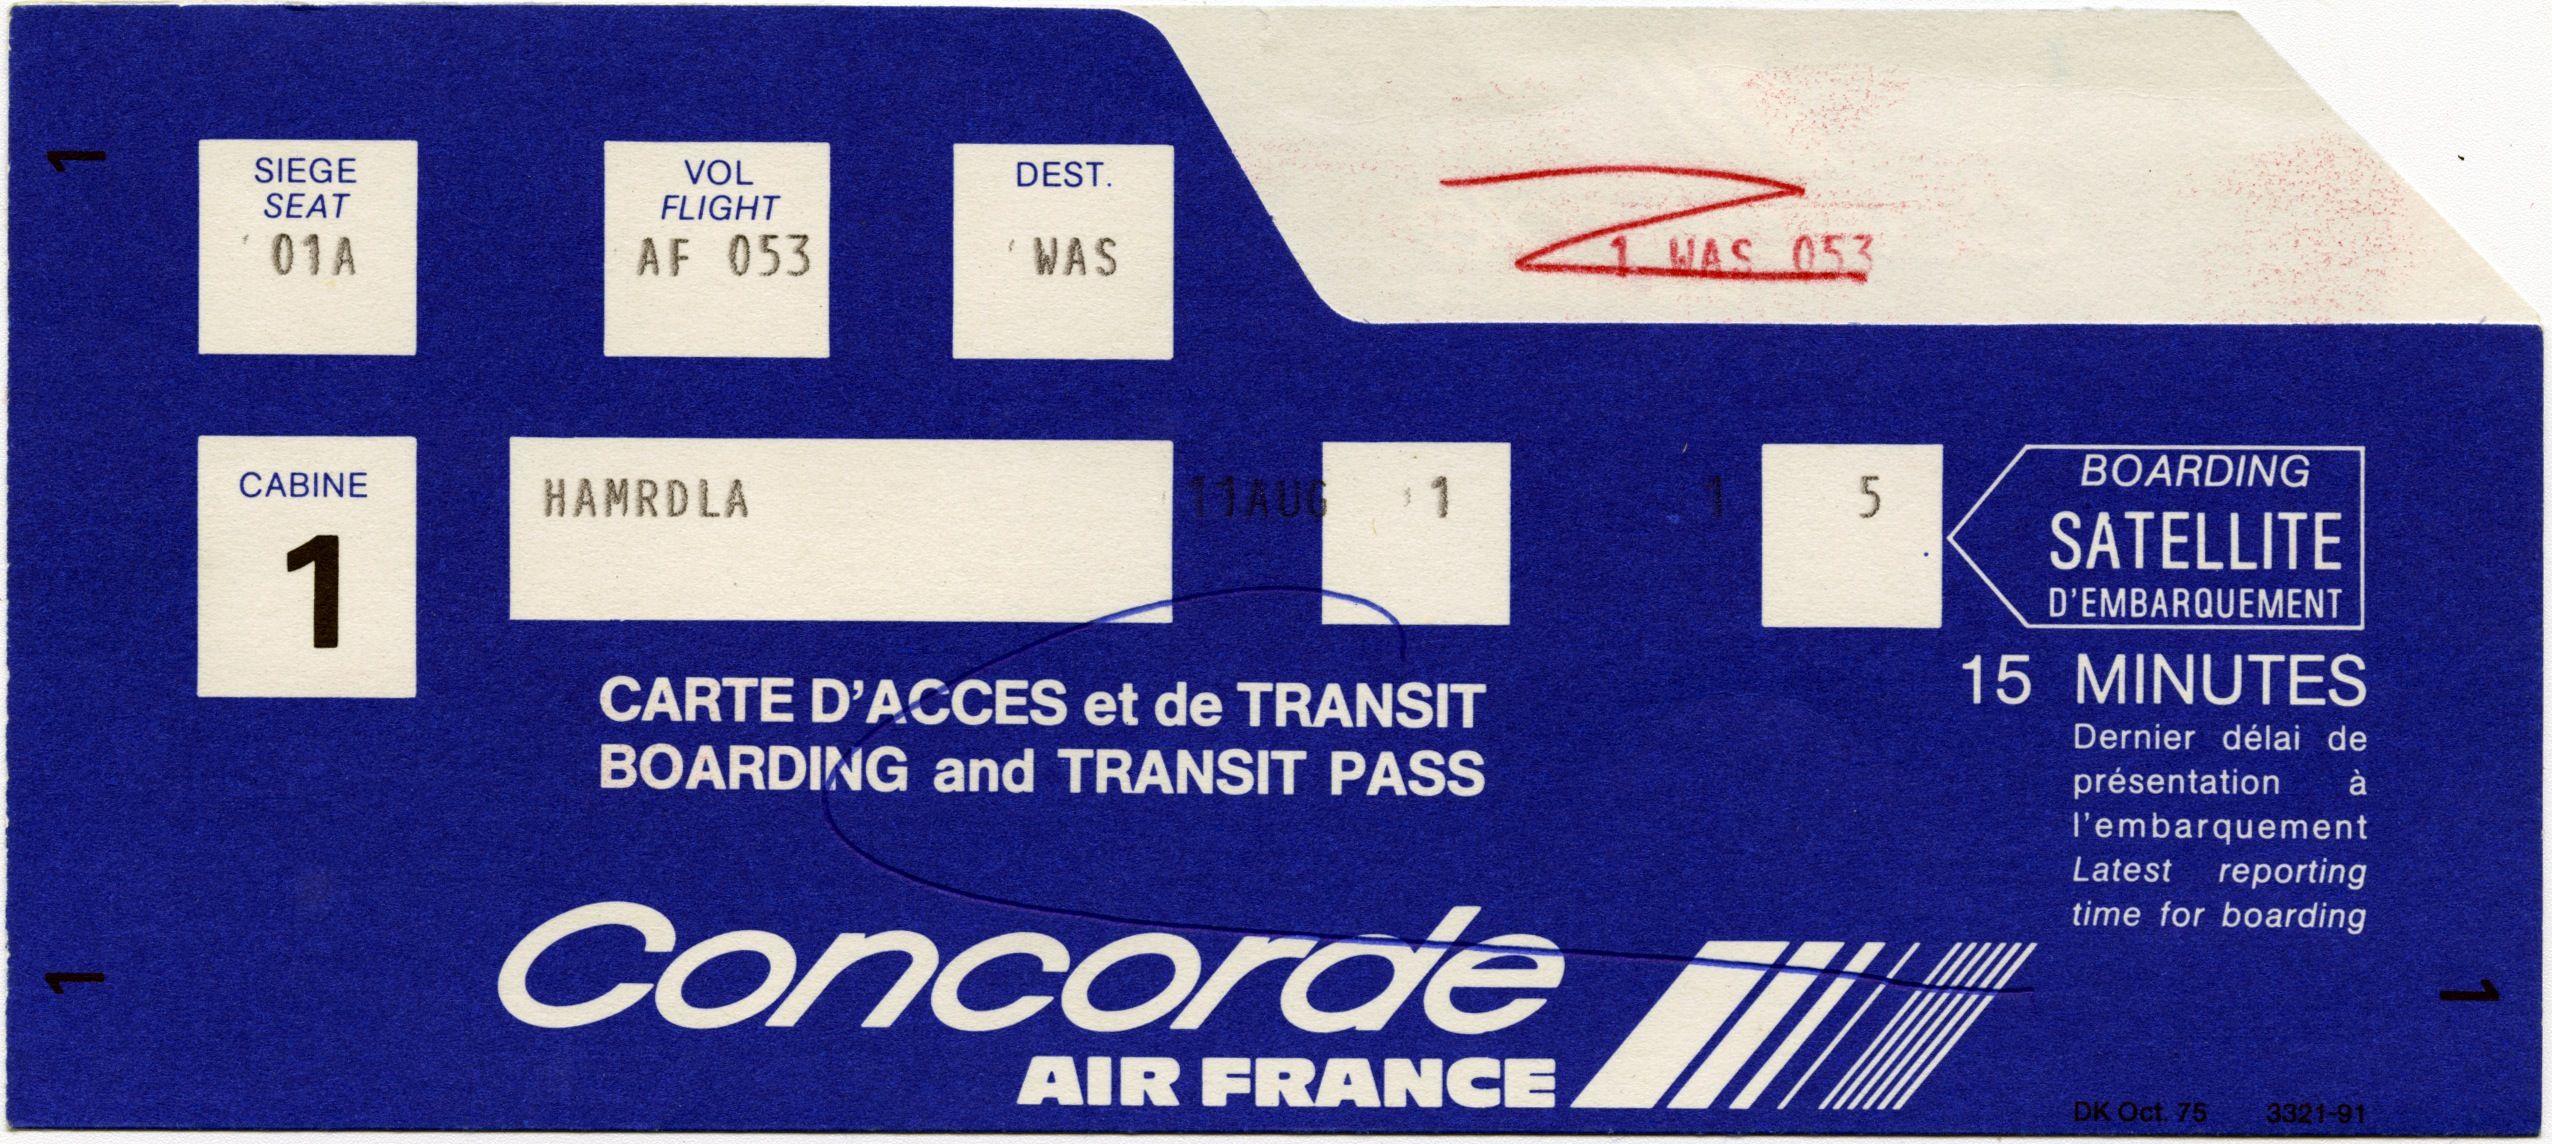 Boarding Pass Air France Concorde San Francisco International